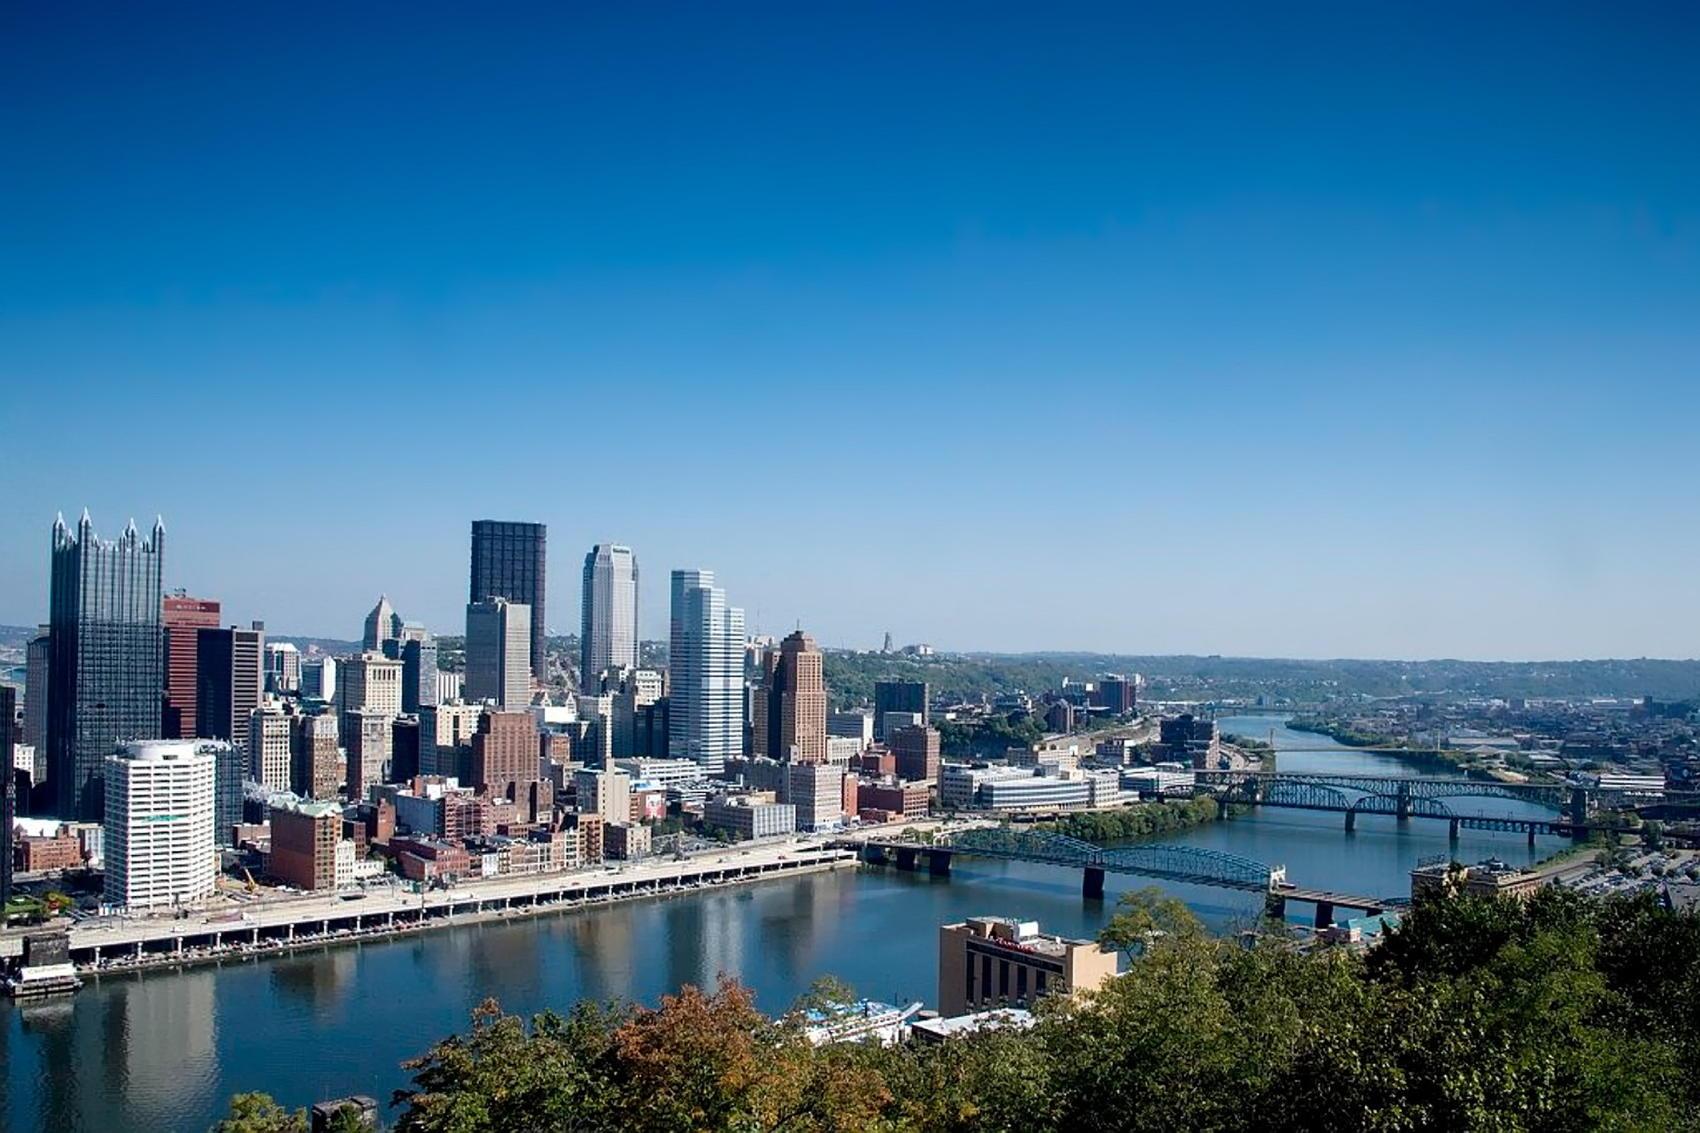 Pittsburgh - Image by David Mark